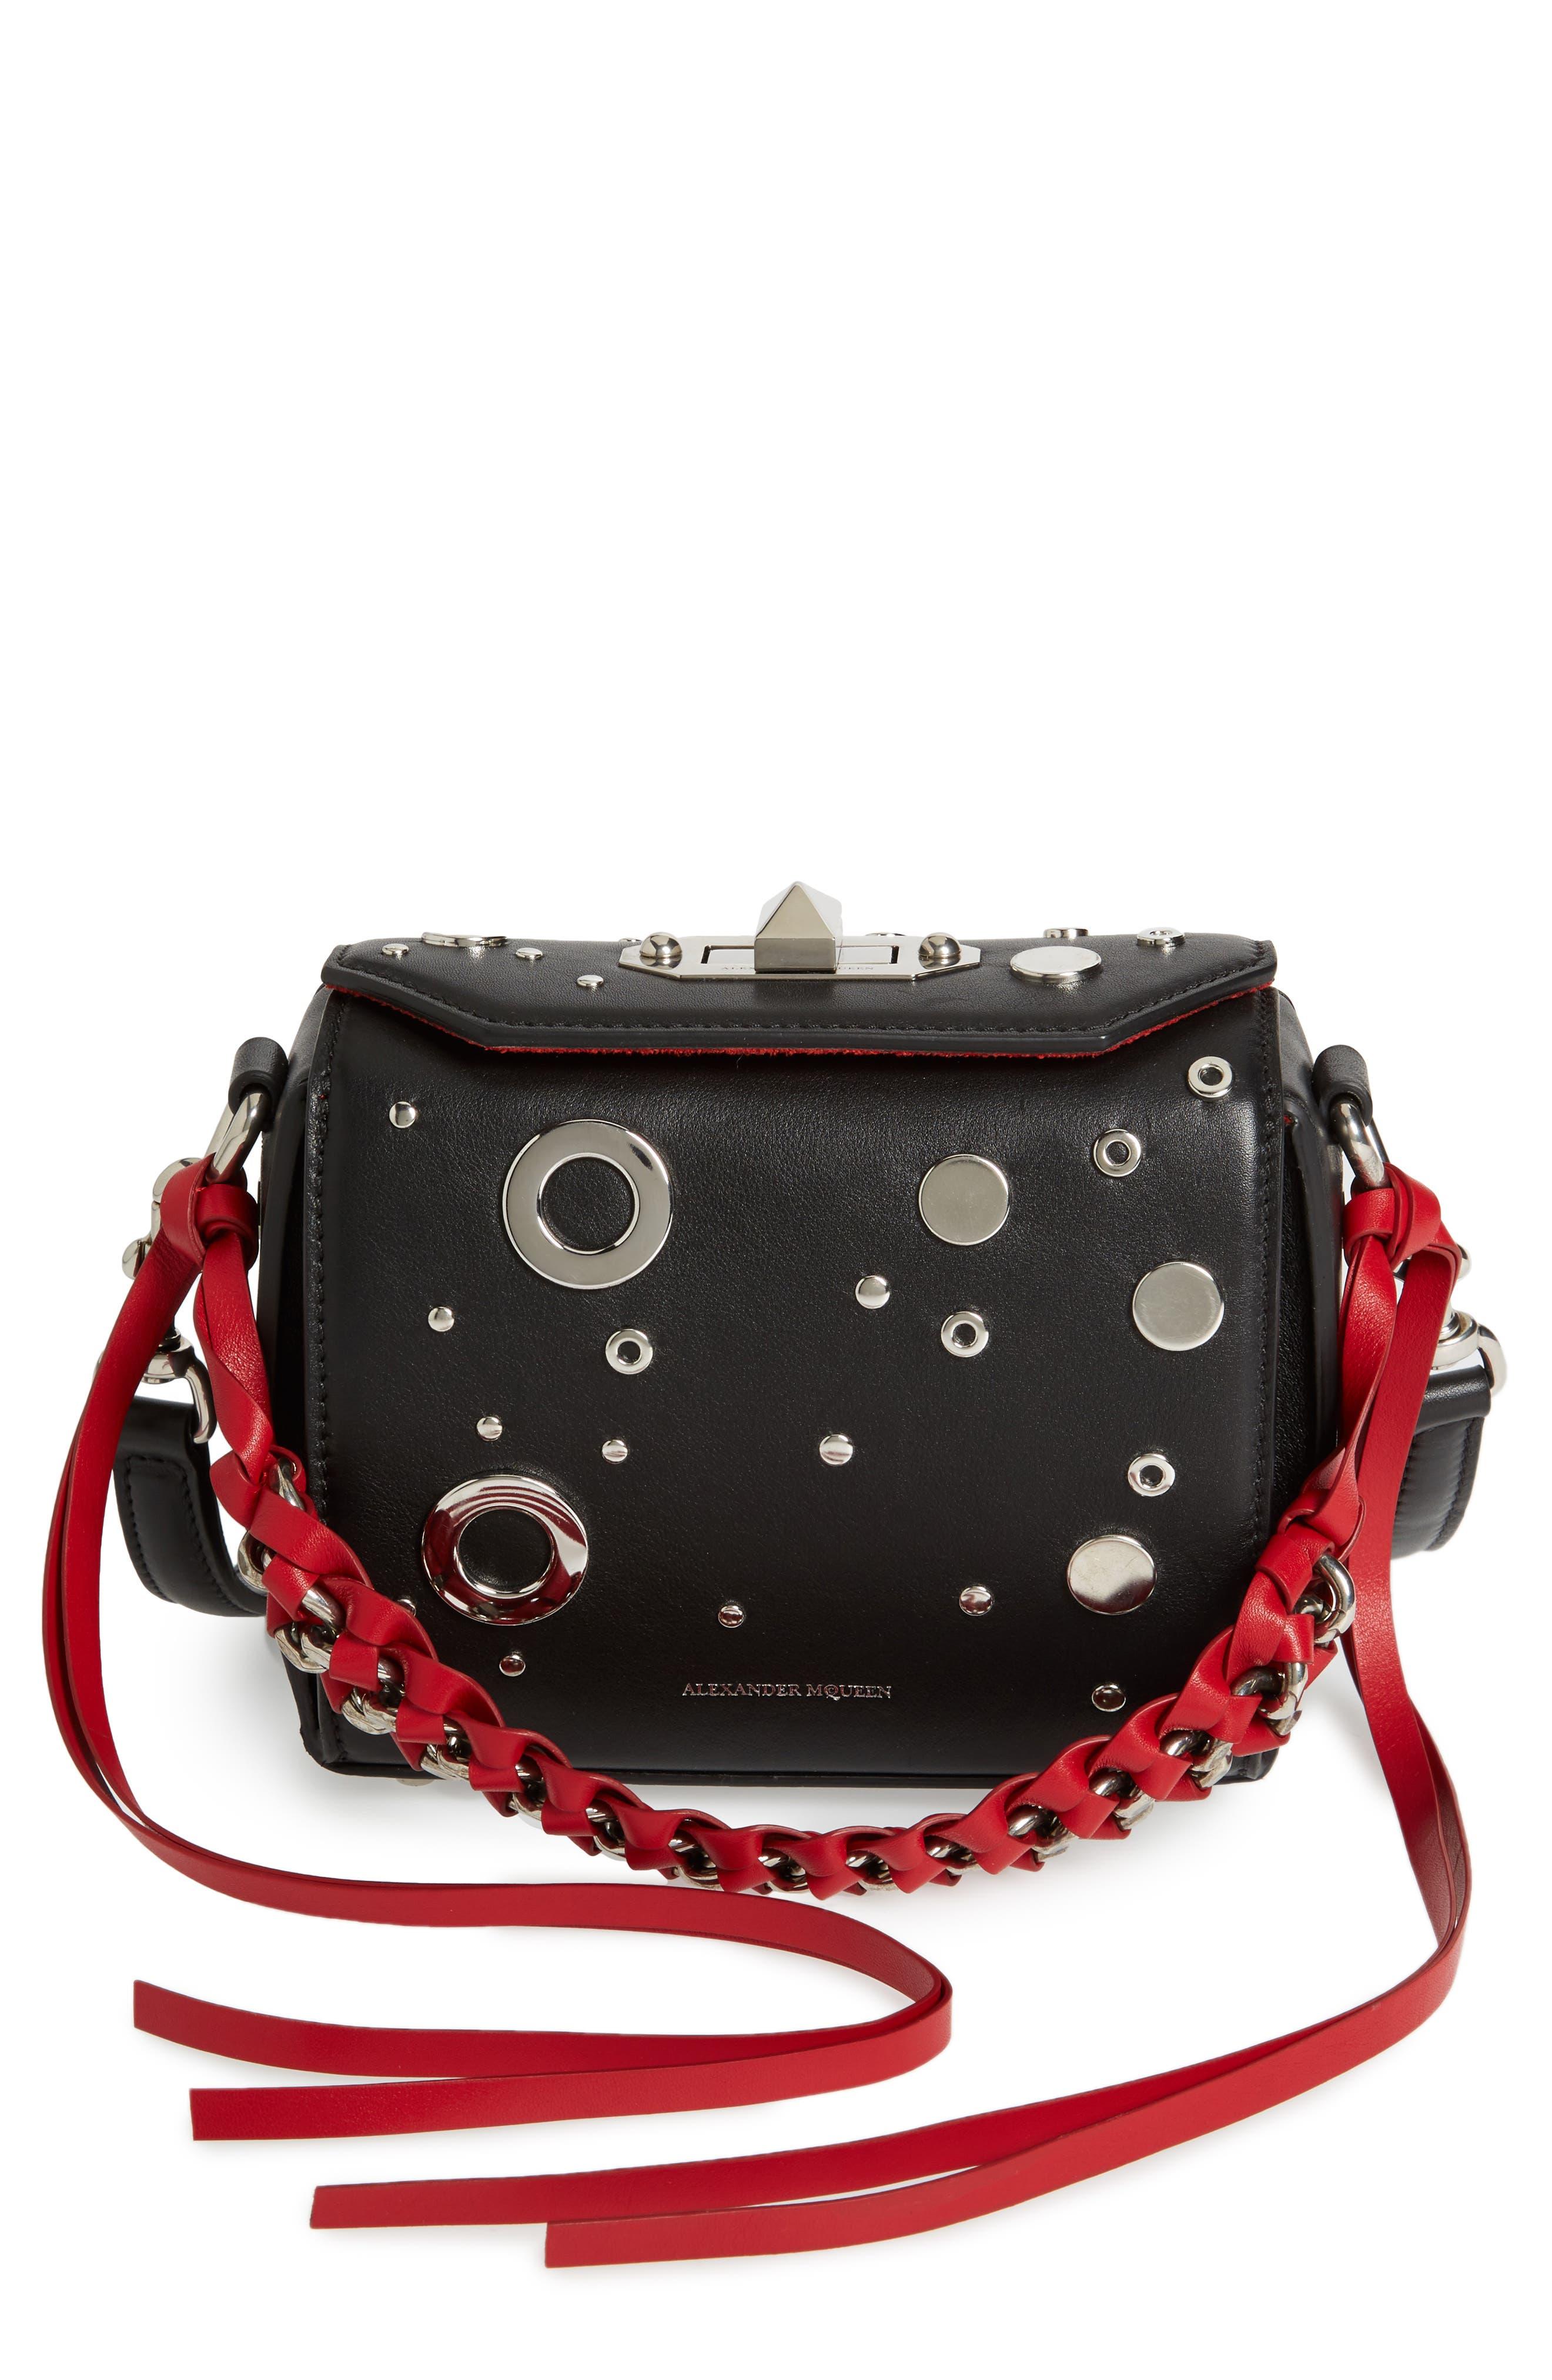 Box Bag 16 Matte Calfskin Bag,                             Main thumbnail 1, color,                             Black/ Red